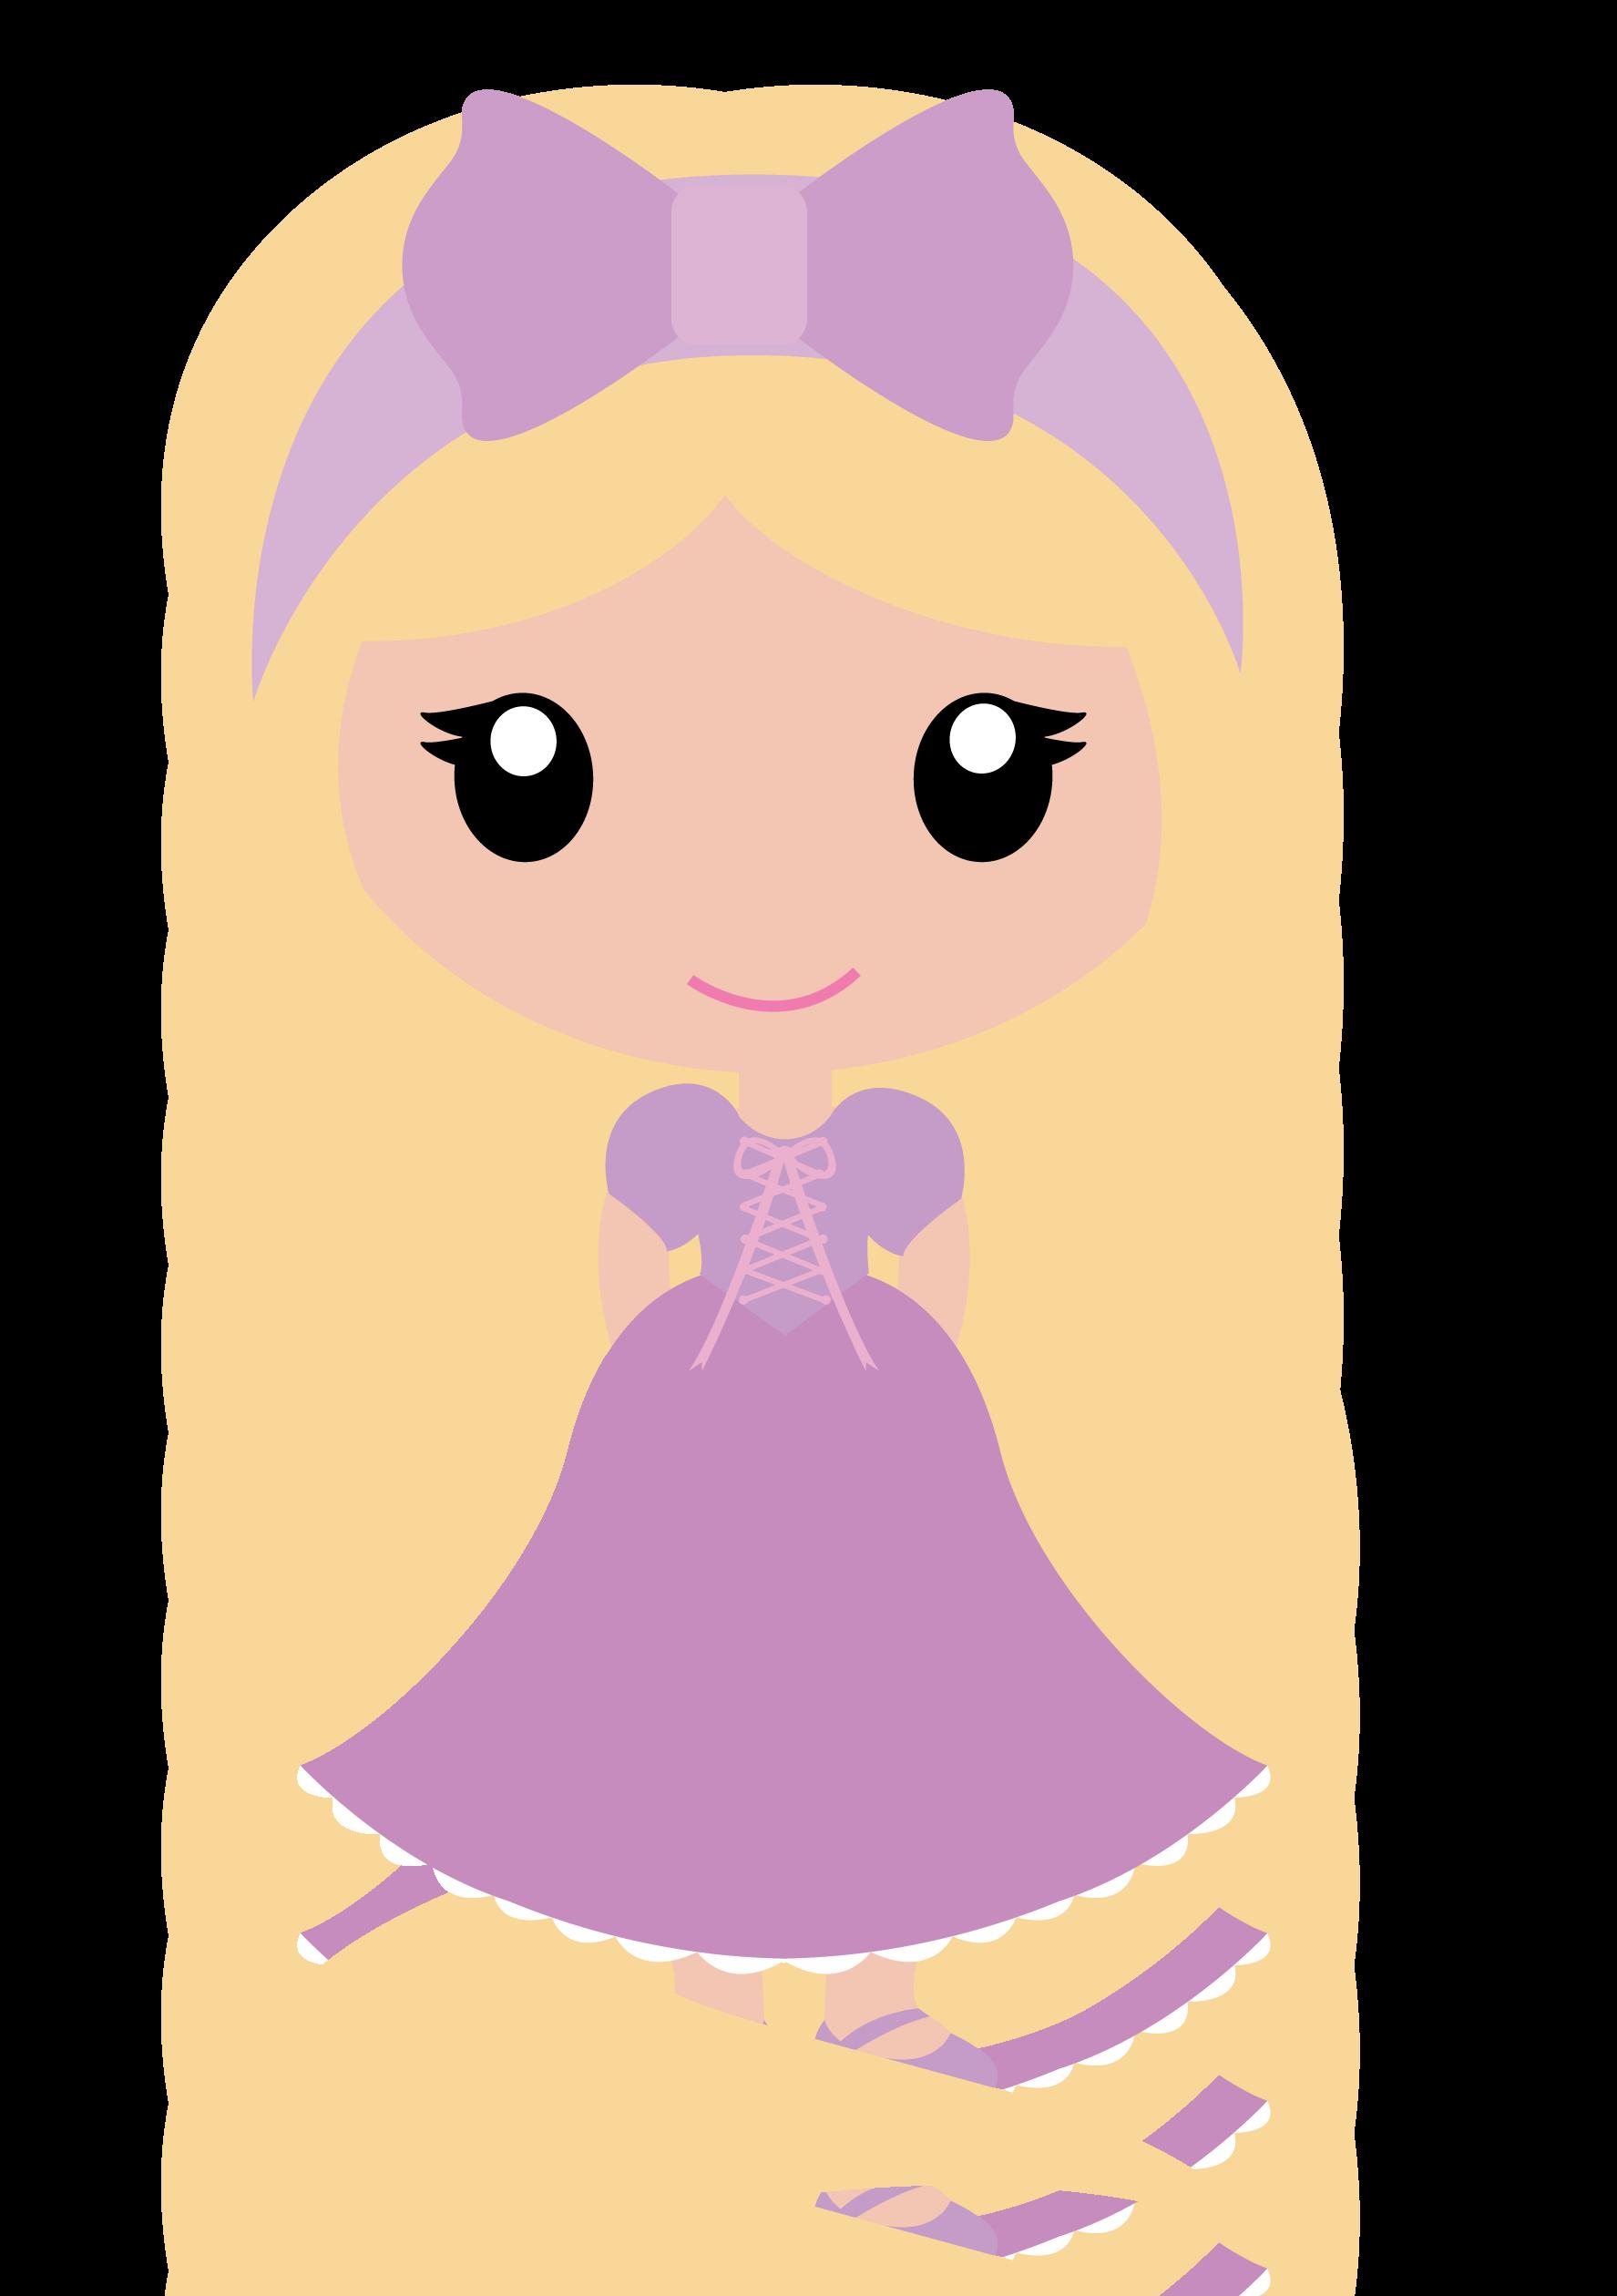 Rapunzel clipart crown. Princesas klouisedigiart fairytaledolls png